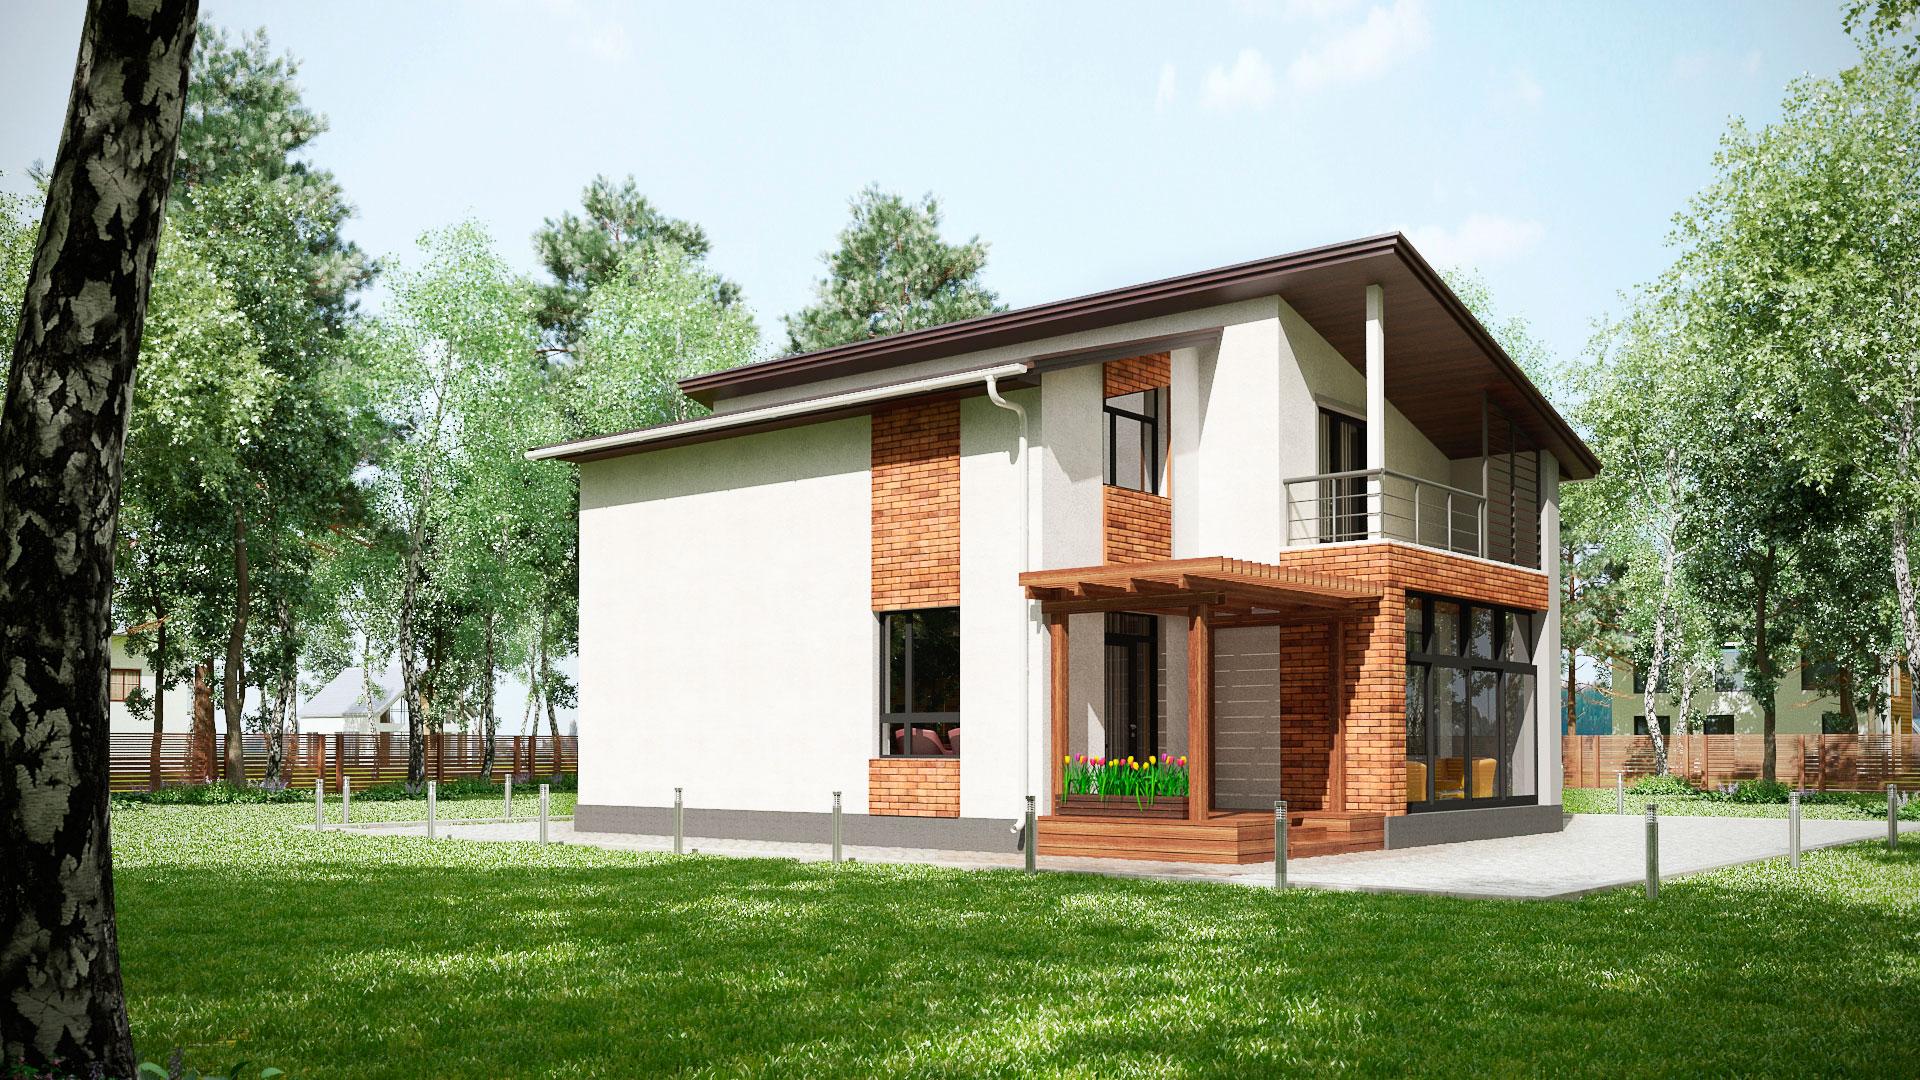 Боковой фасад двухэтажного дома БЭНПАН, проект МС-202.